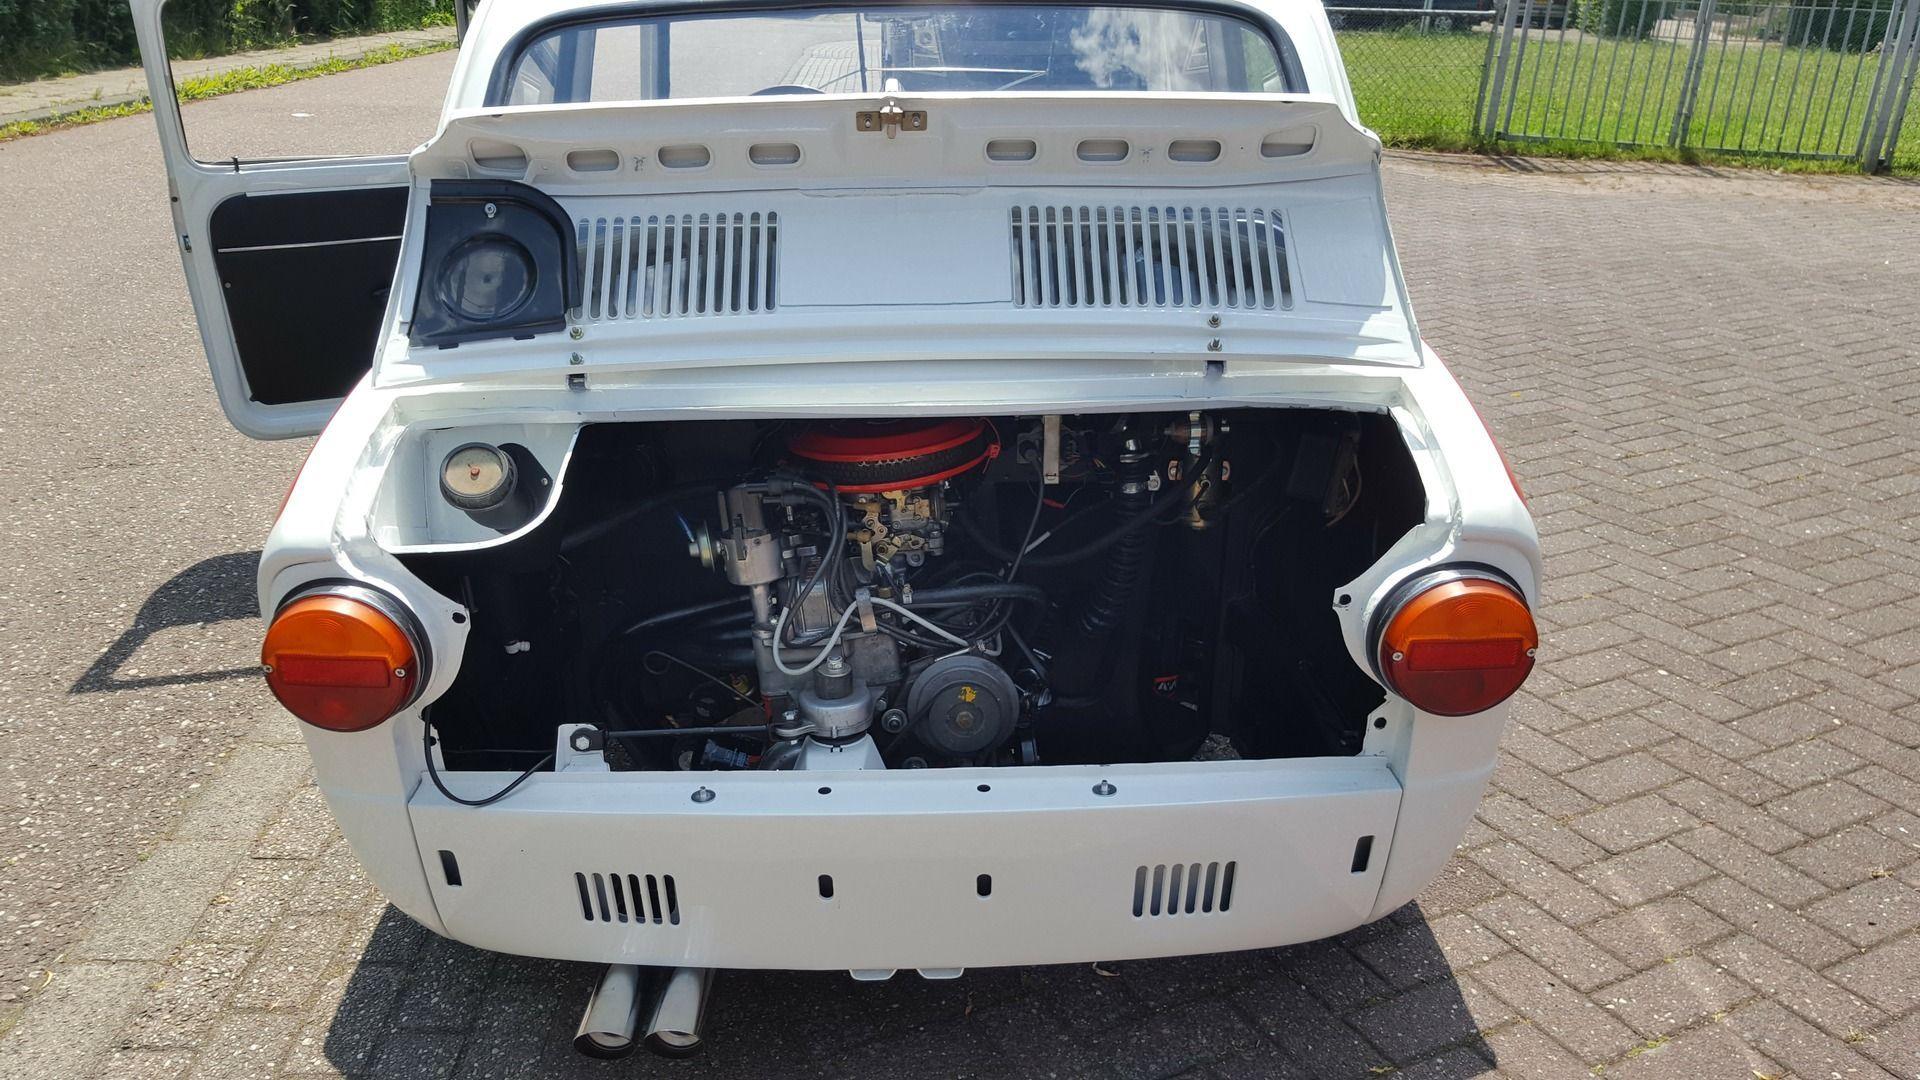 Fiat 850 Engine Swap Google Search Fiat 850 Fiat Engine Swap